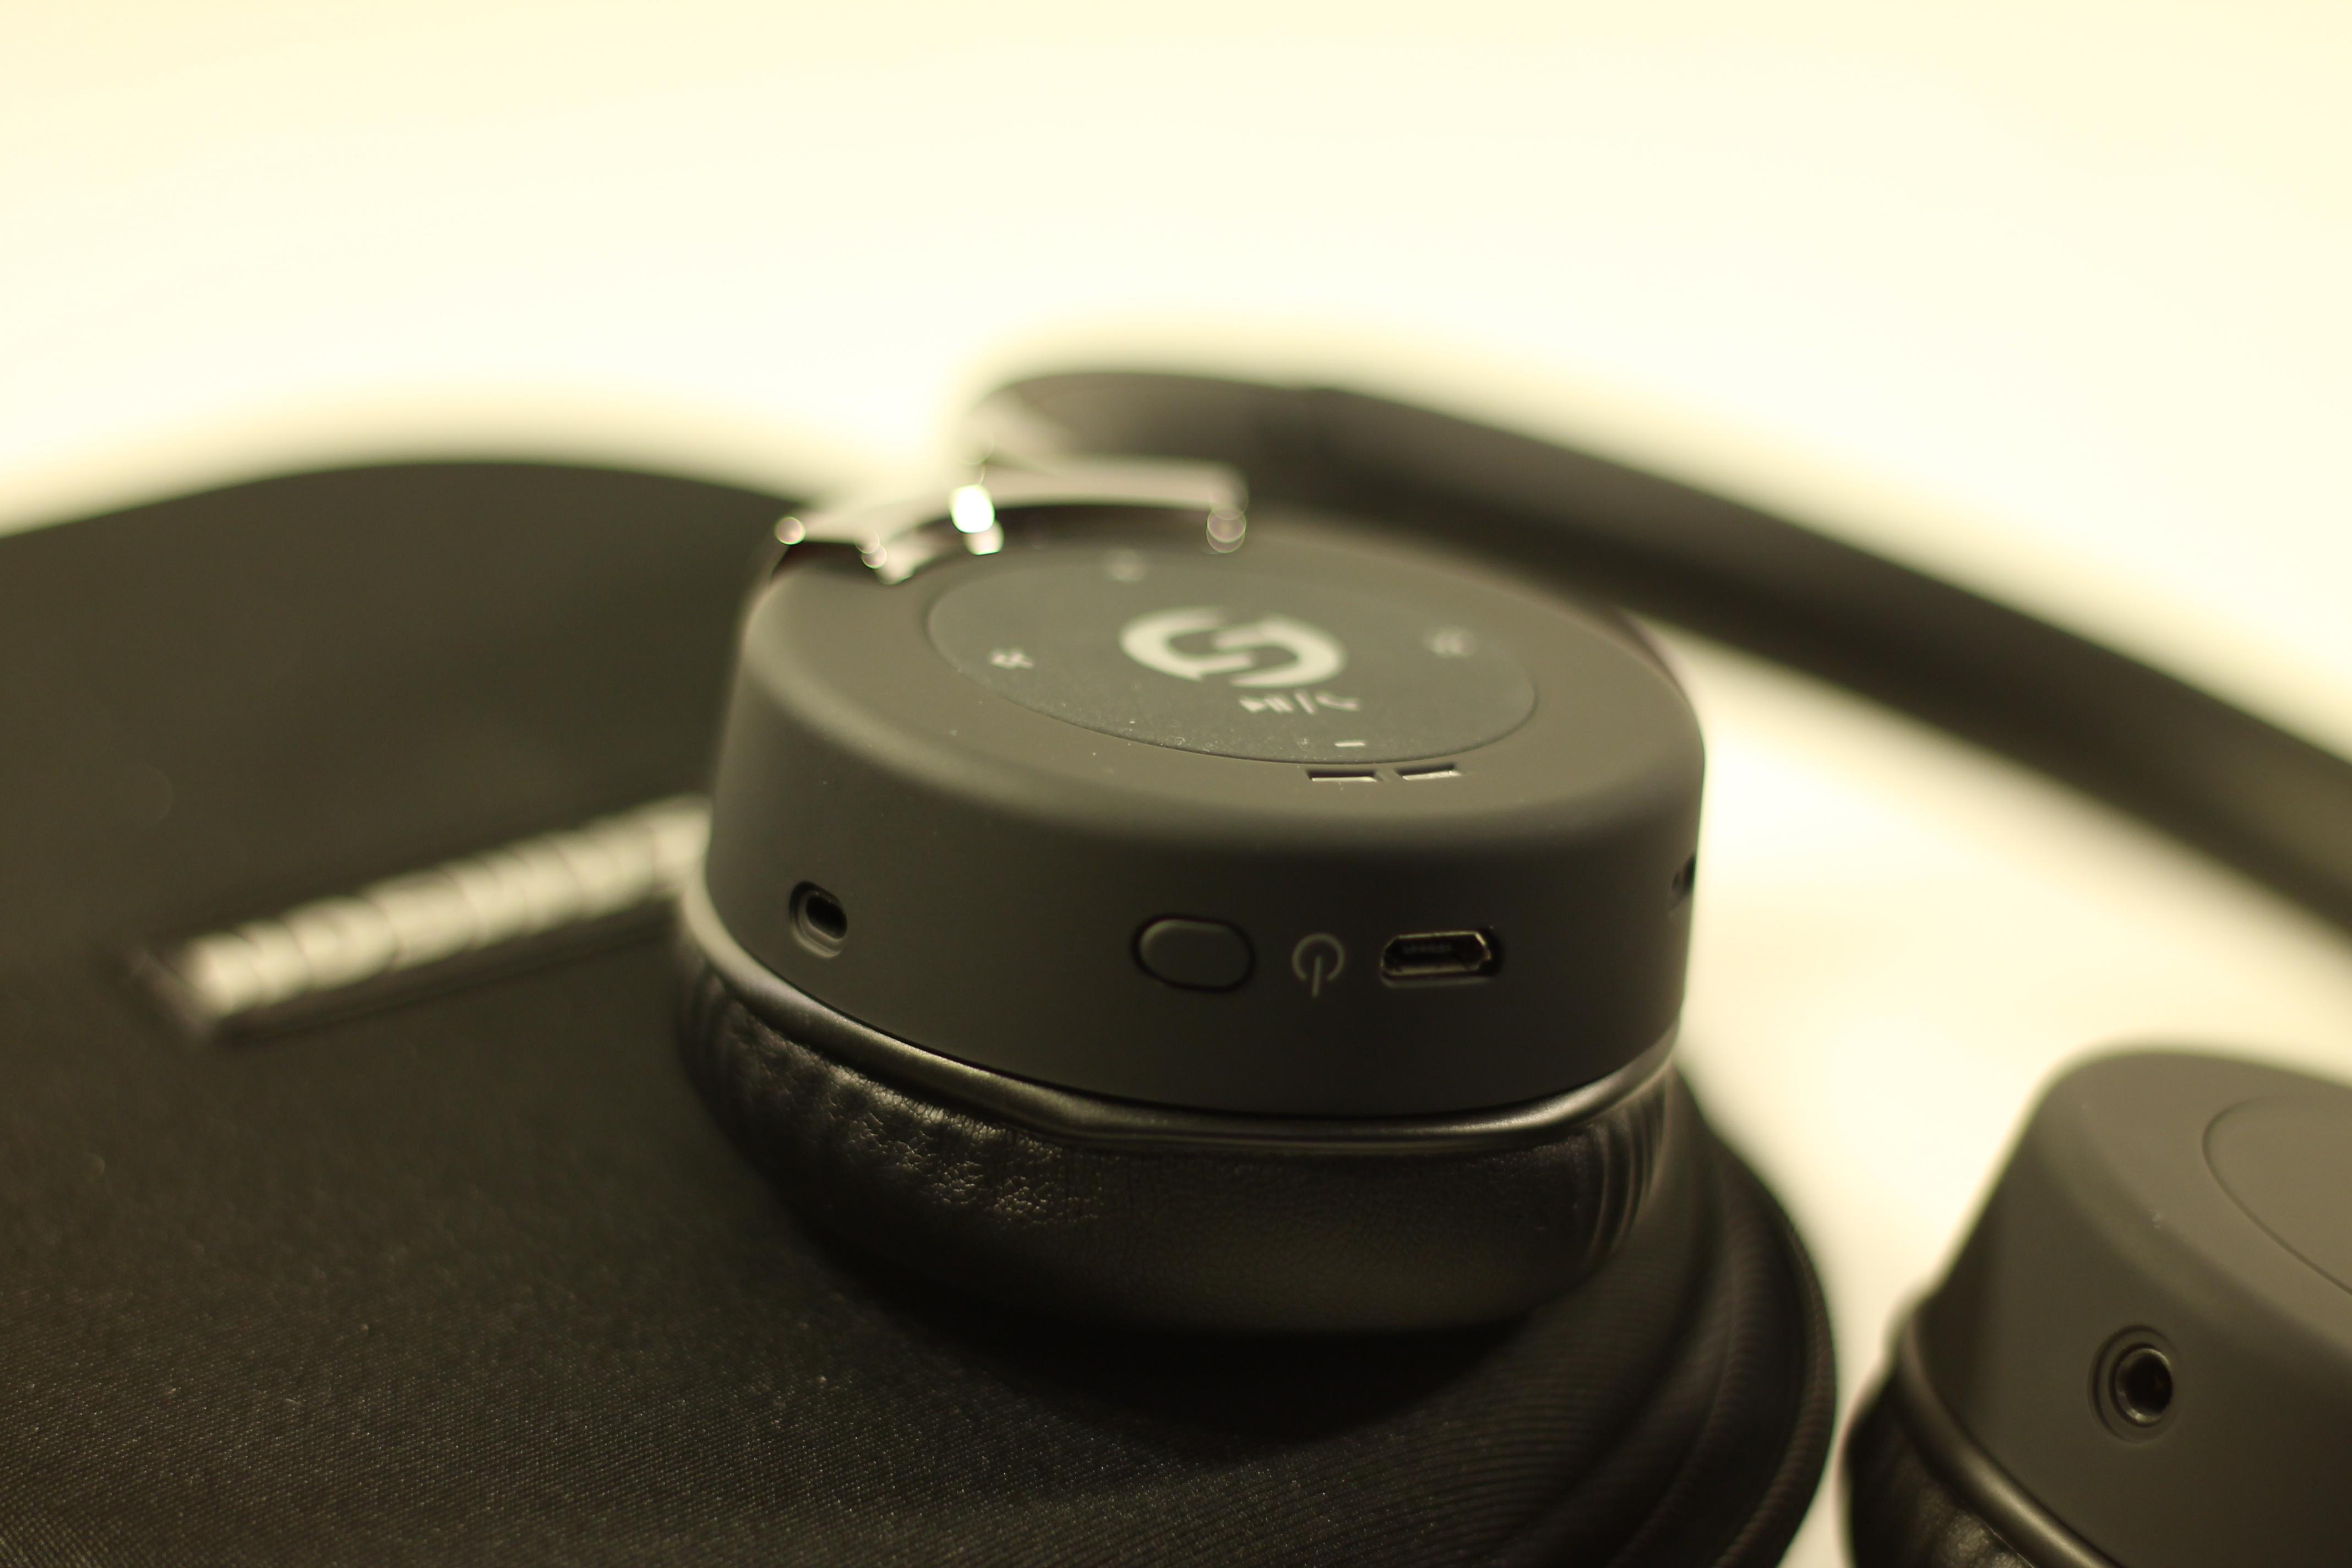 samson rte 2 bluetooth headphones reviews head. Black Bedroom Furniture Sets. Home Design Ideas